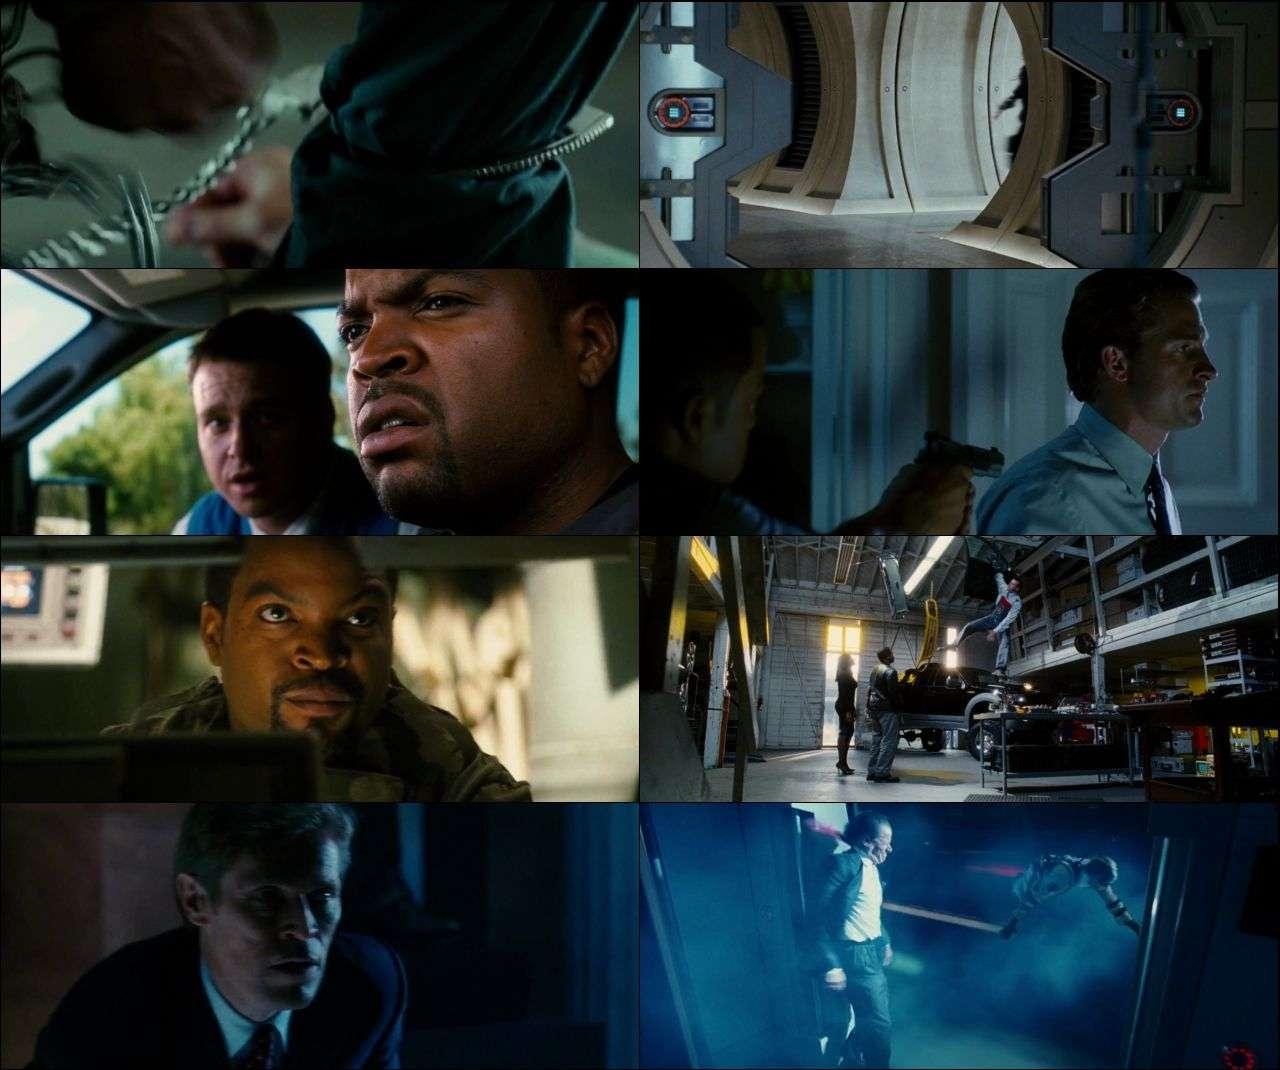 xXx: State of the Union - Xxx 2 (2005) full türkçe dublaj film indir